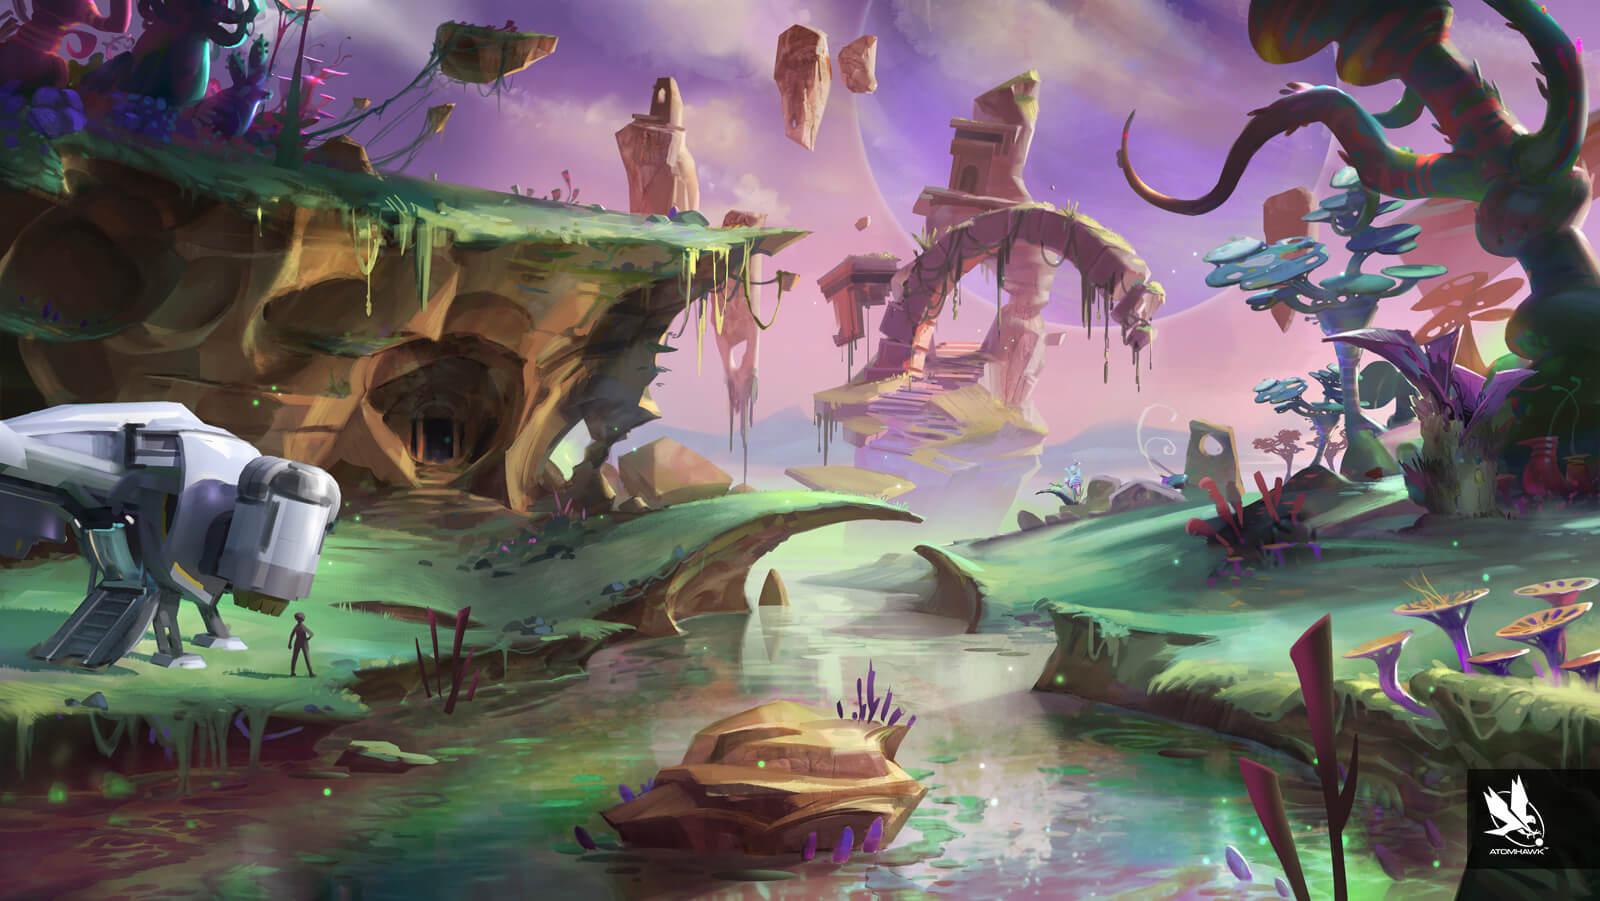 Atomhawk_News_May-2018_Case-Study_Unity-3D-Game-Kit_Environment-Concept-Art1-.jpg